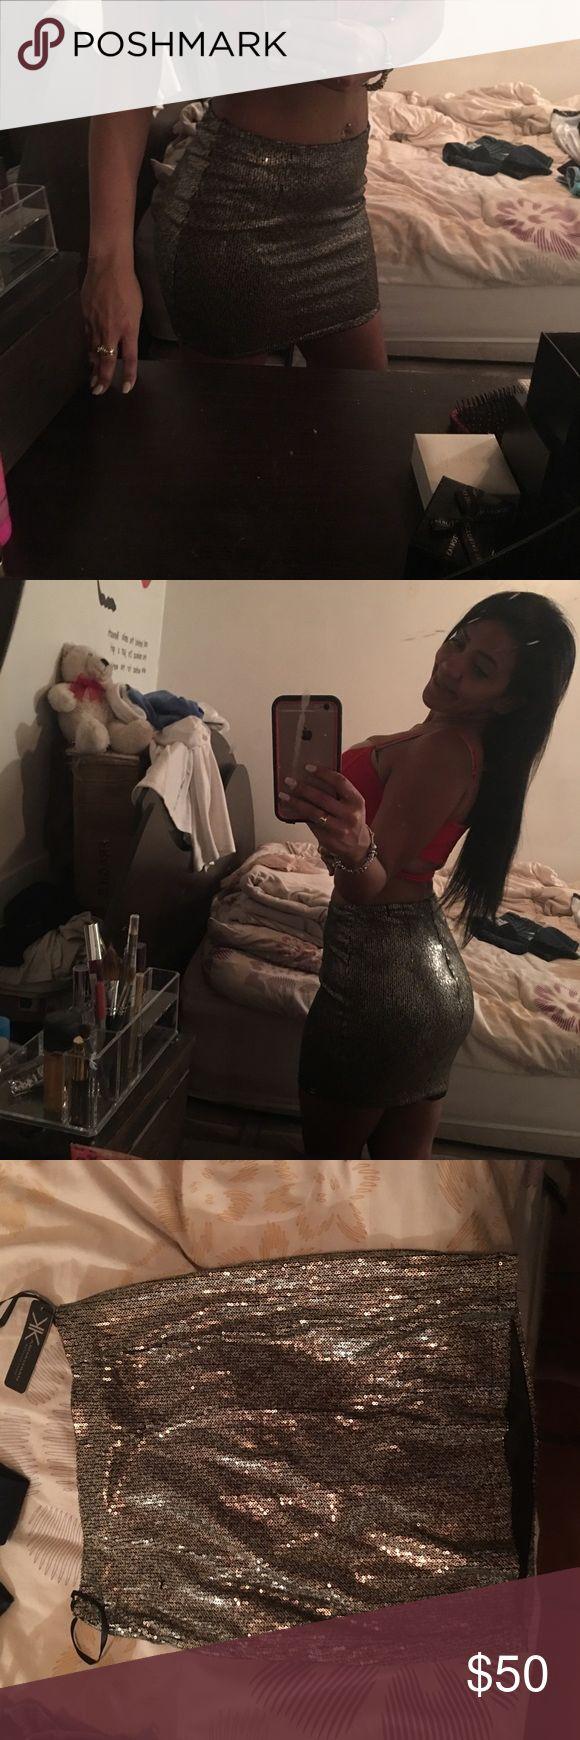 Kim kardashian  skirt xs but is run like s New with tag Kim kardashian Skirts